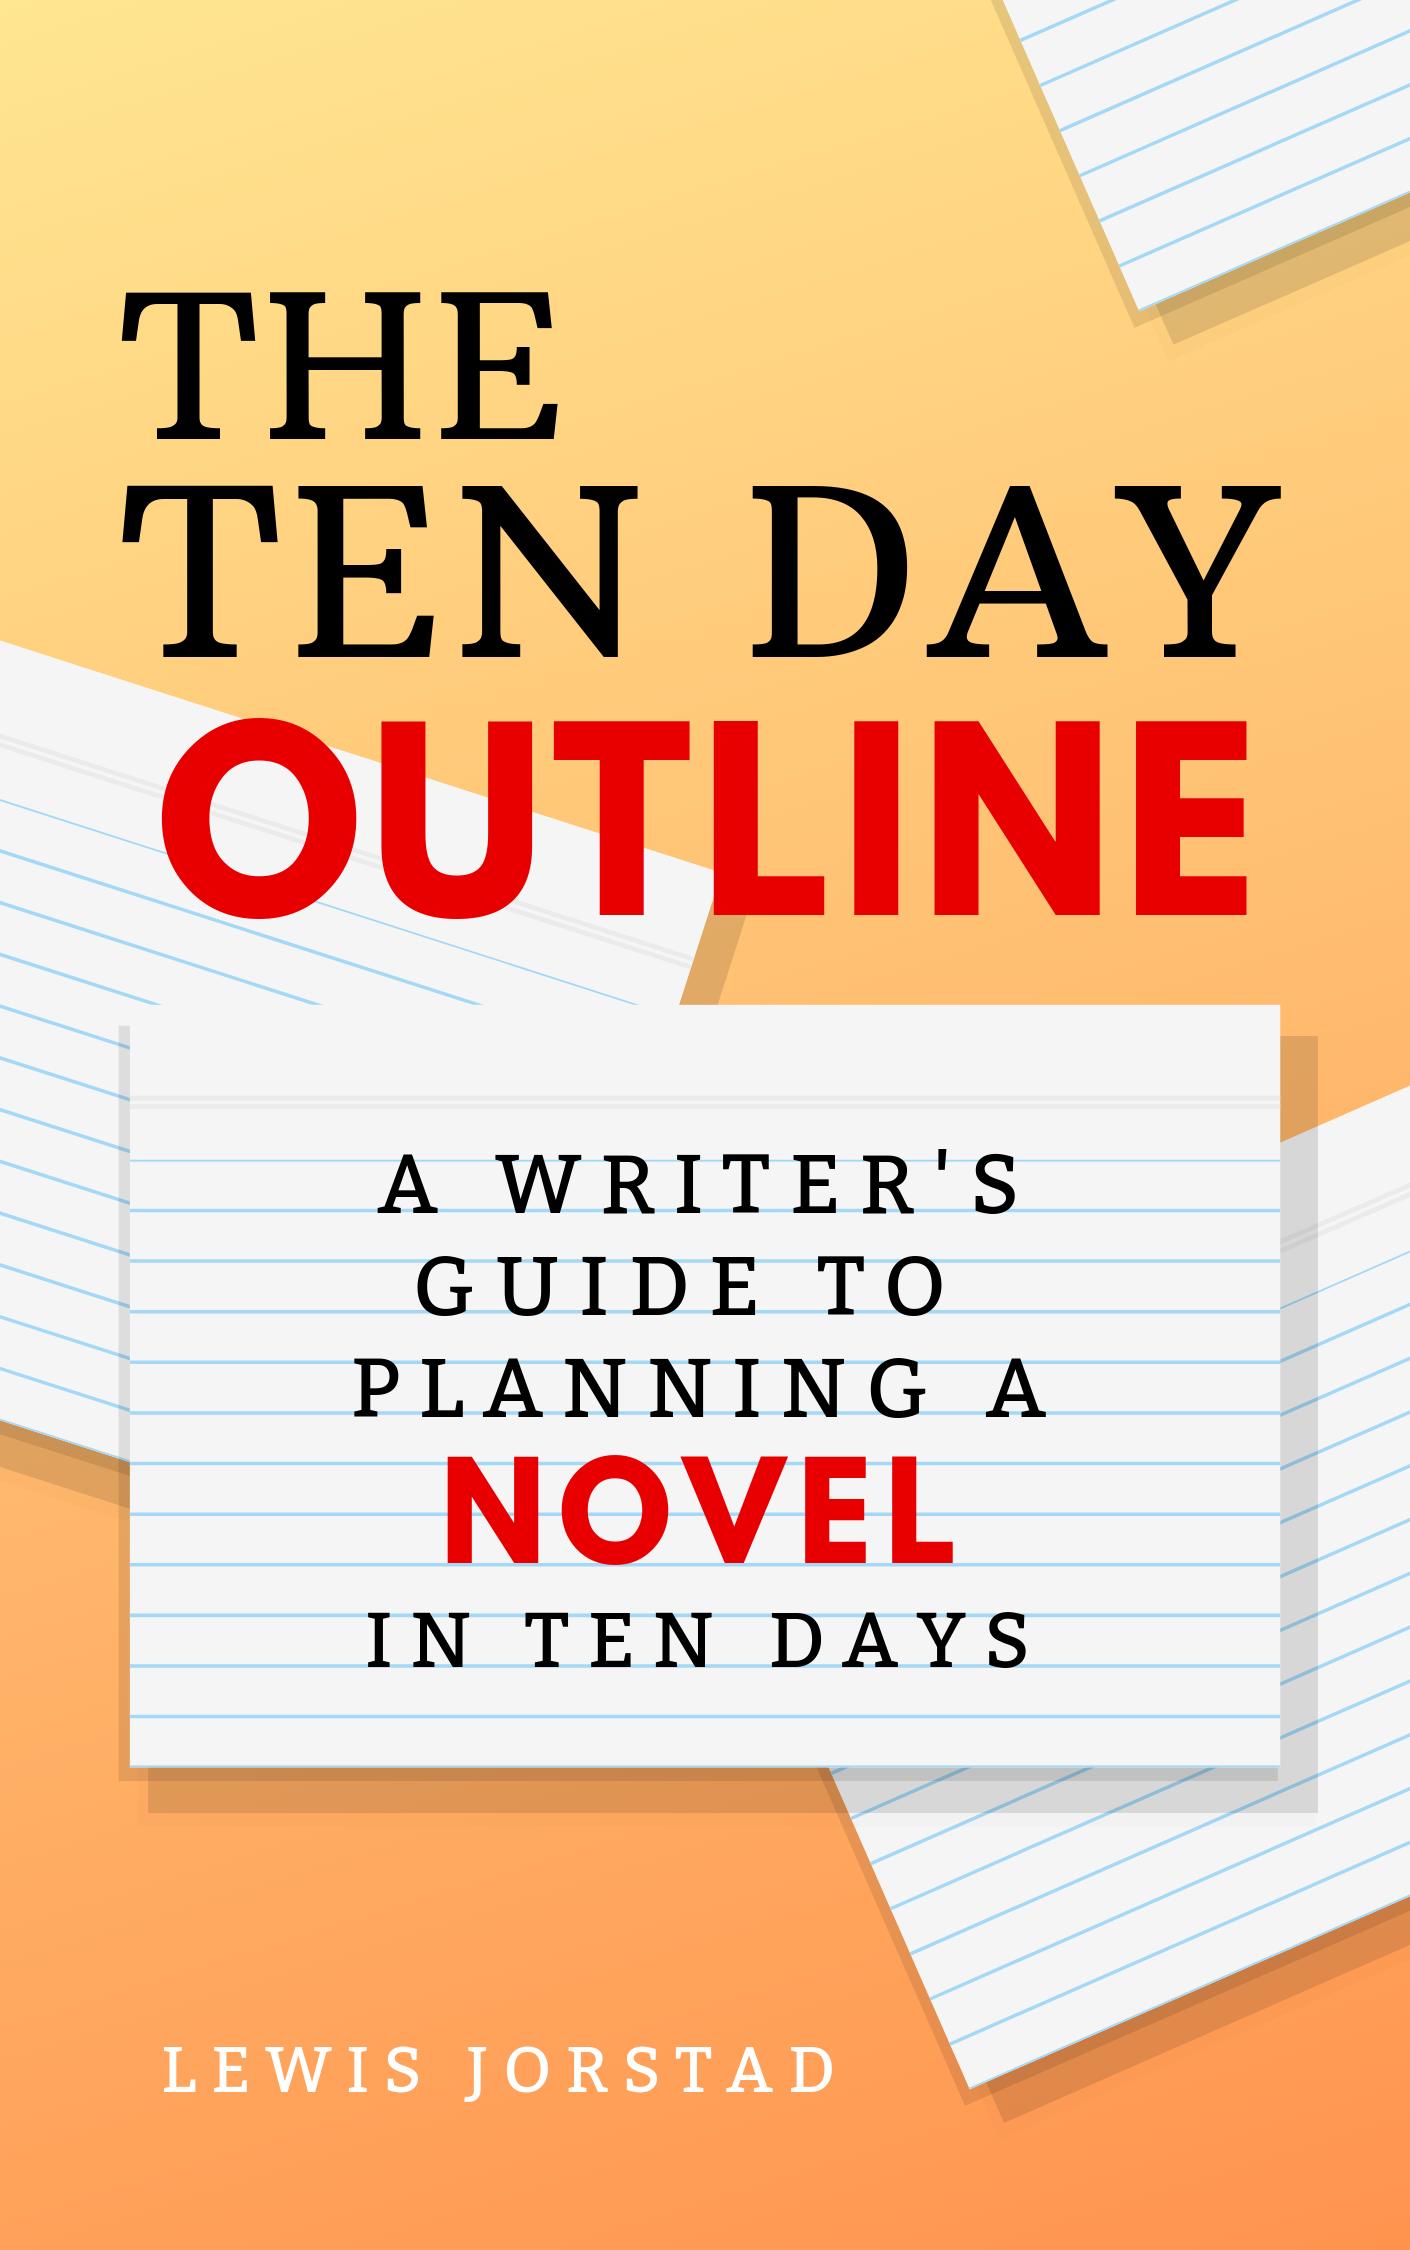 10 Steps For Outlining Your Next Novel